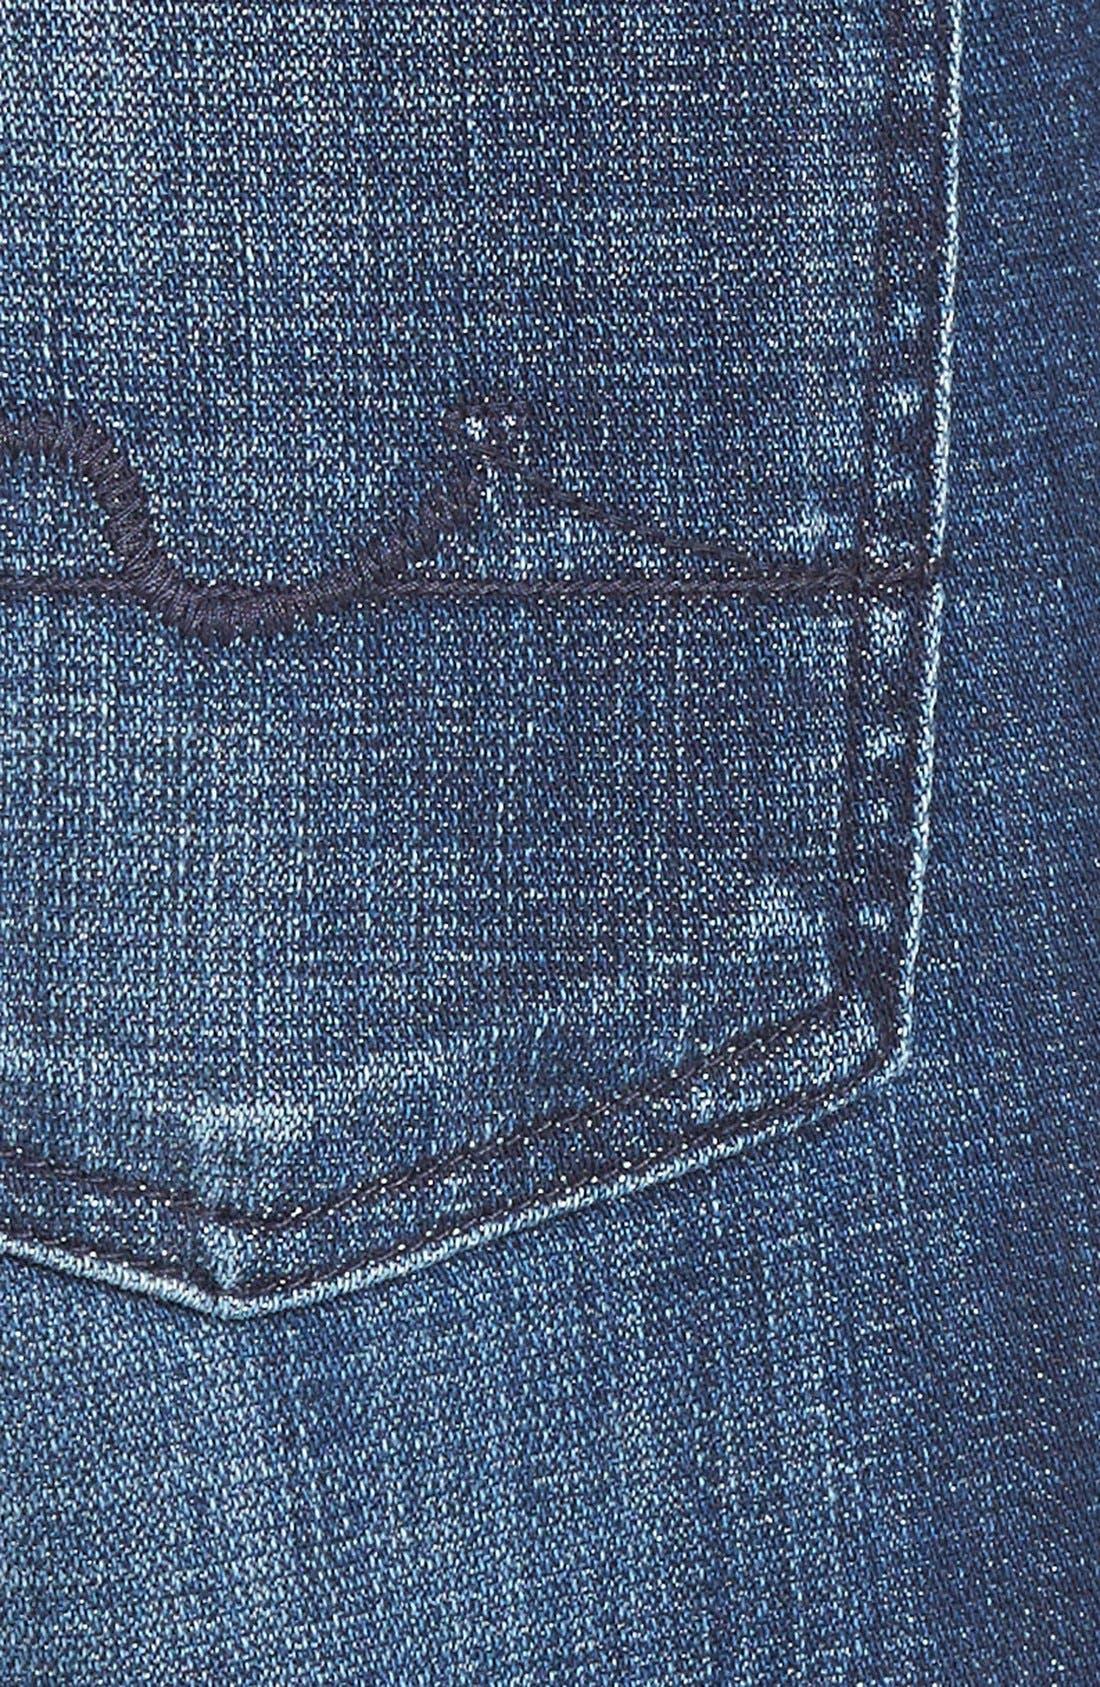 Alternate Image 3  - 7 For All Mankind® 'Josefina' Boyfriend Jeans (Royal Broken Twill)